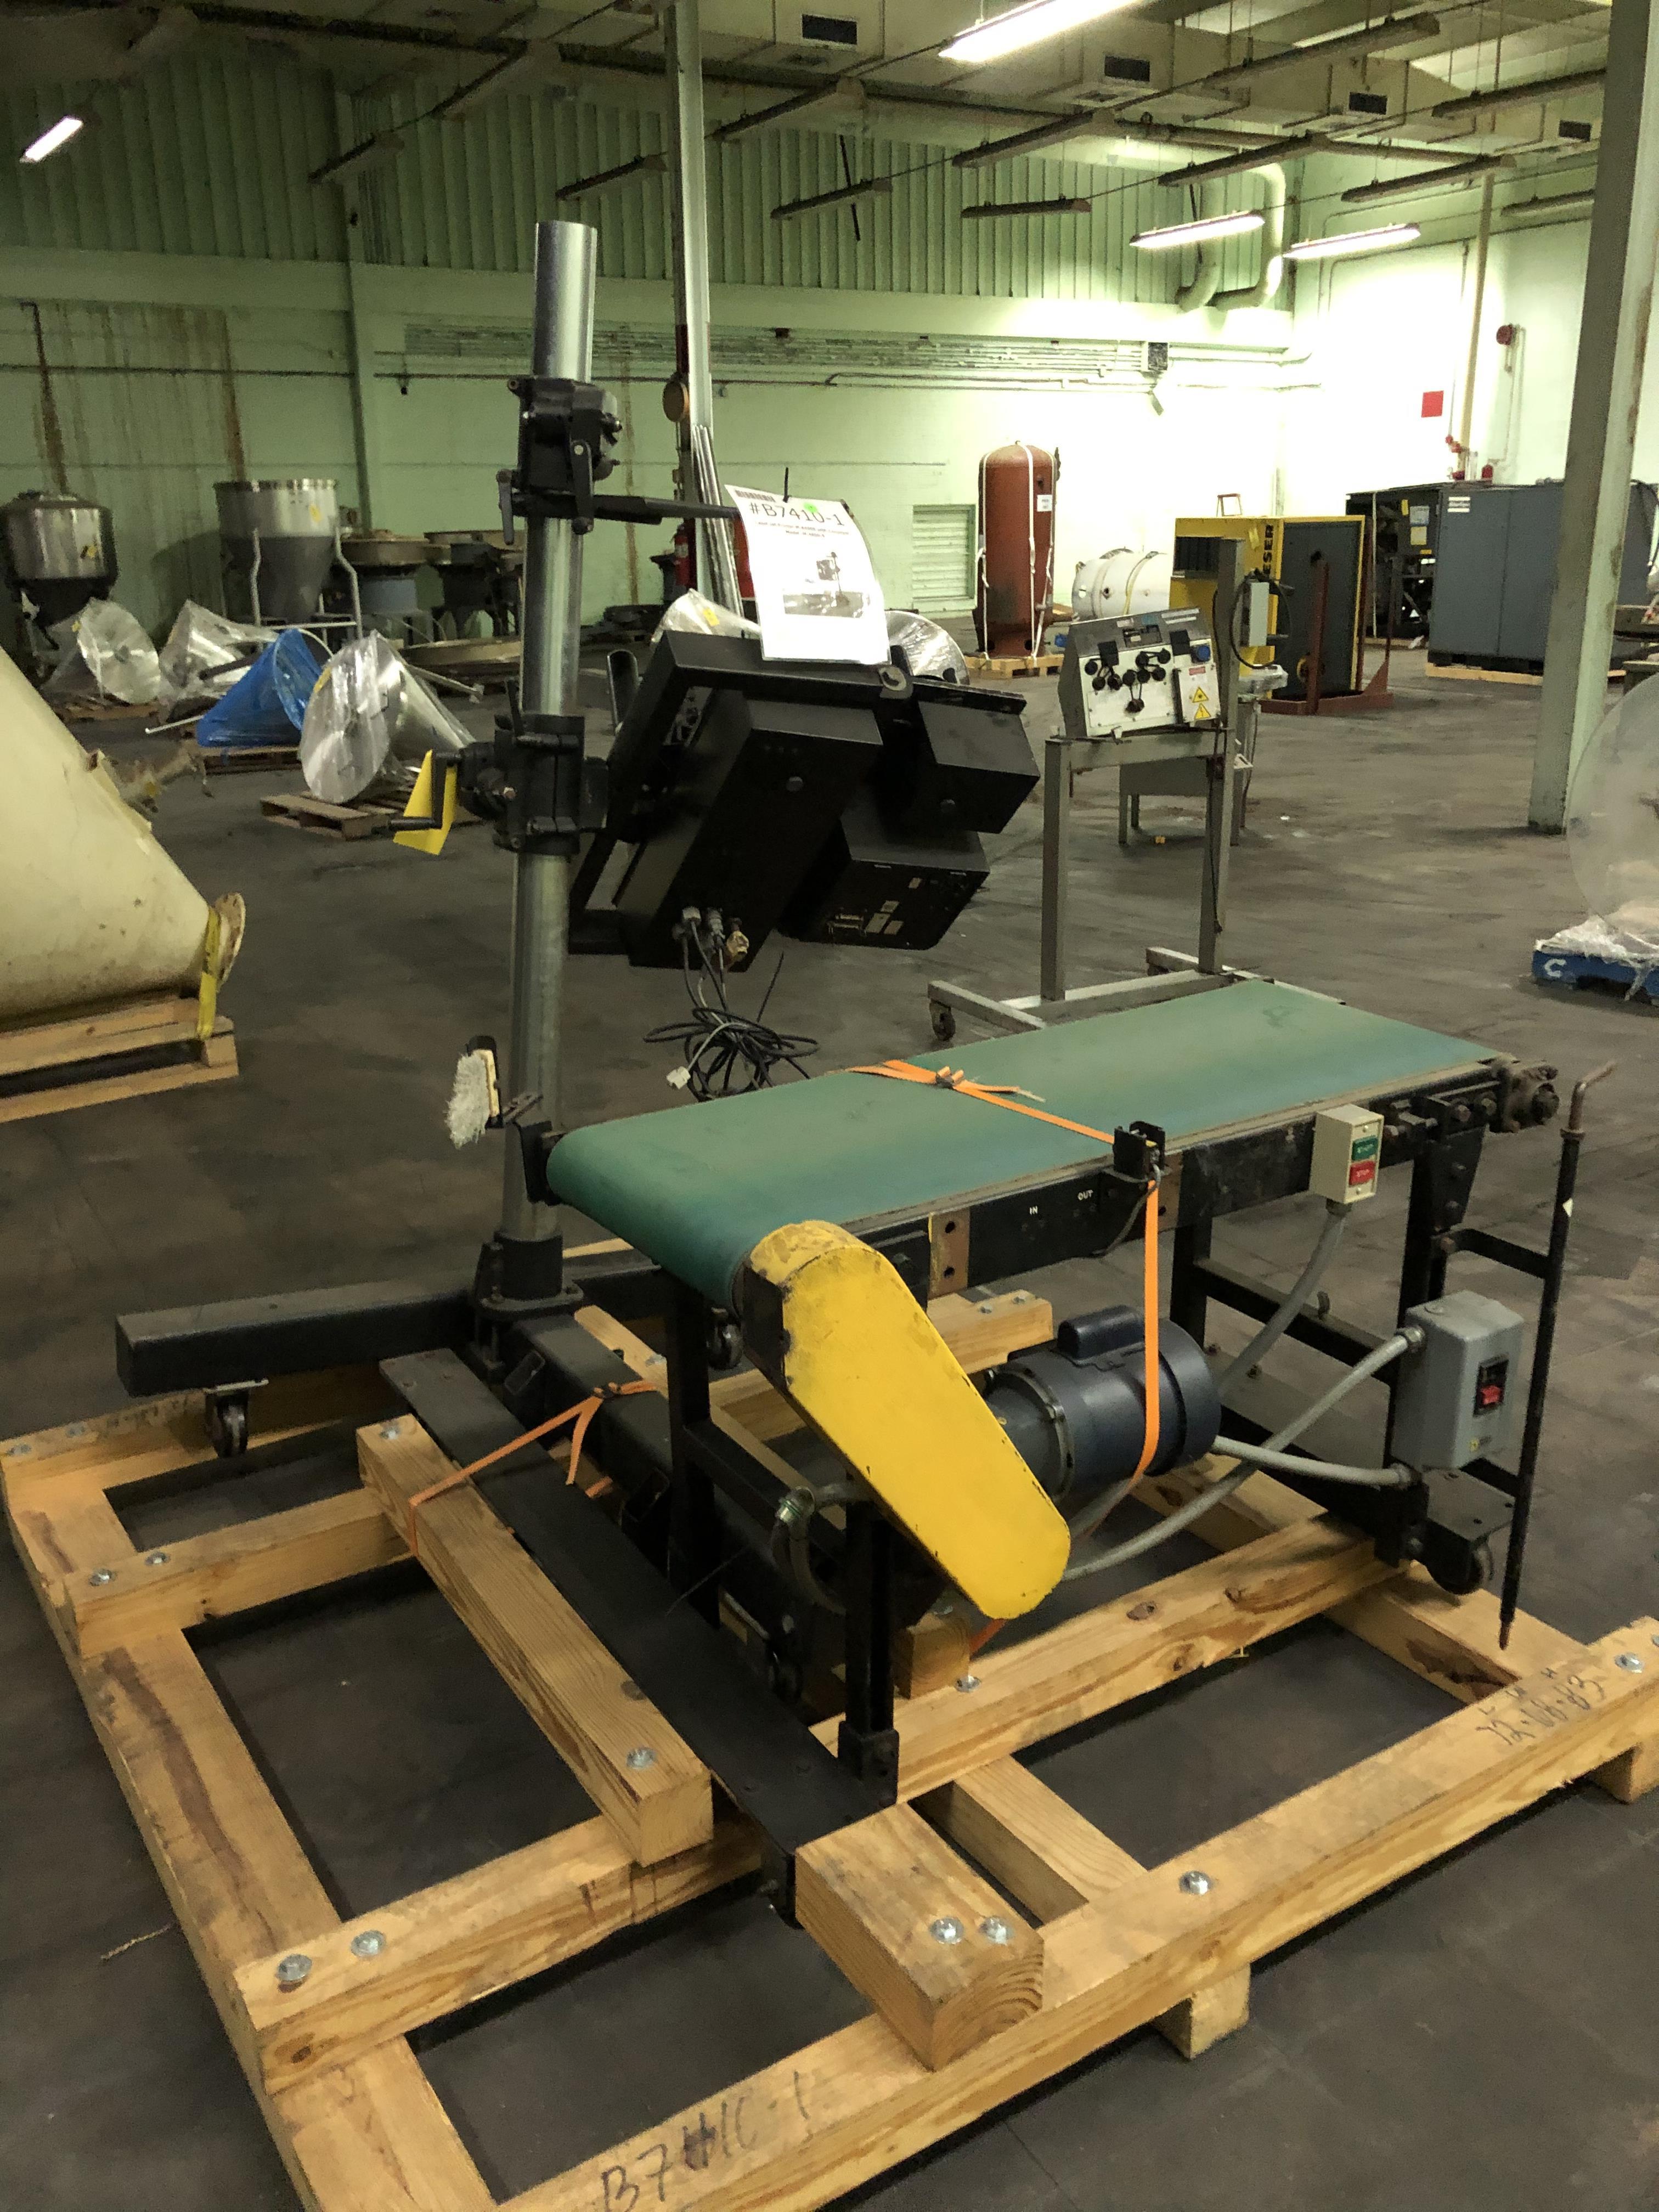 Label Jet Model #8400-S Printer, Includes Conveyor, RIGGING FEE - $175 - Image 3 of 3